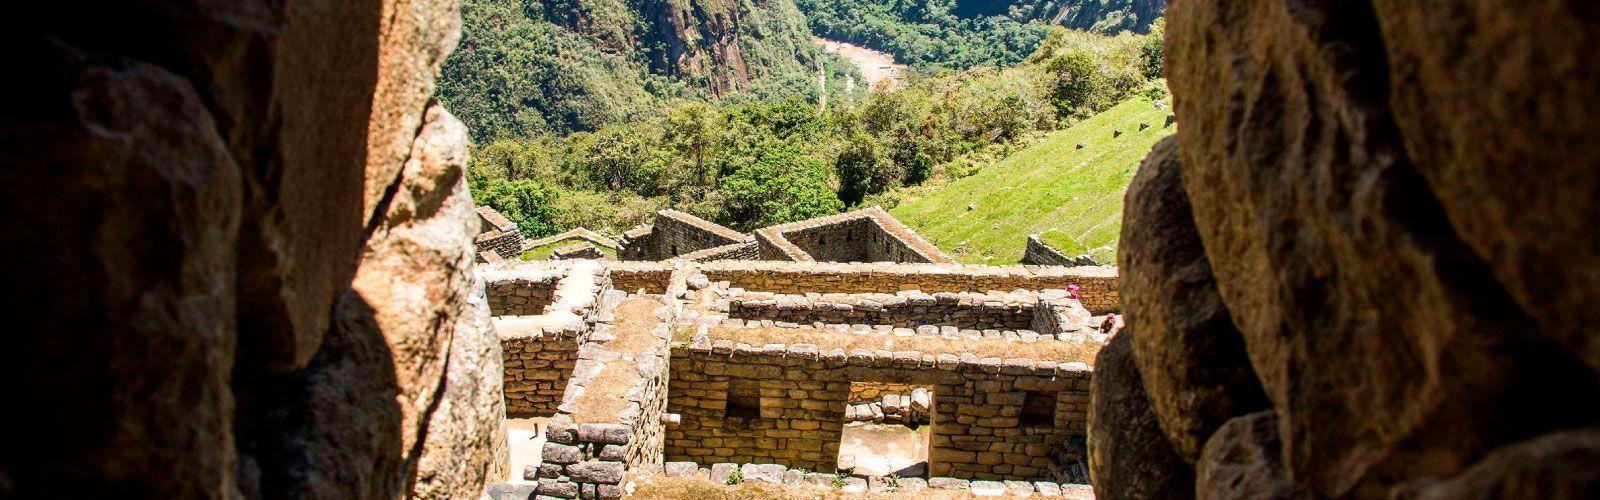 Lares Trek to Machu Picchu 4 days / 3 nights